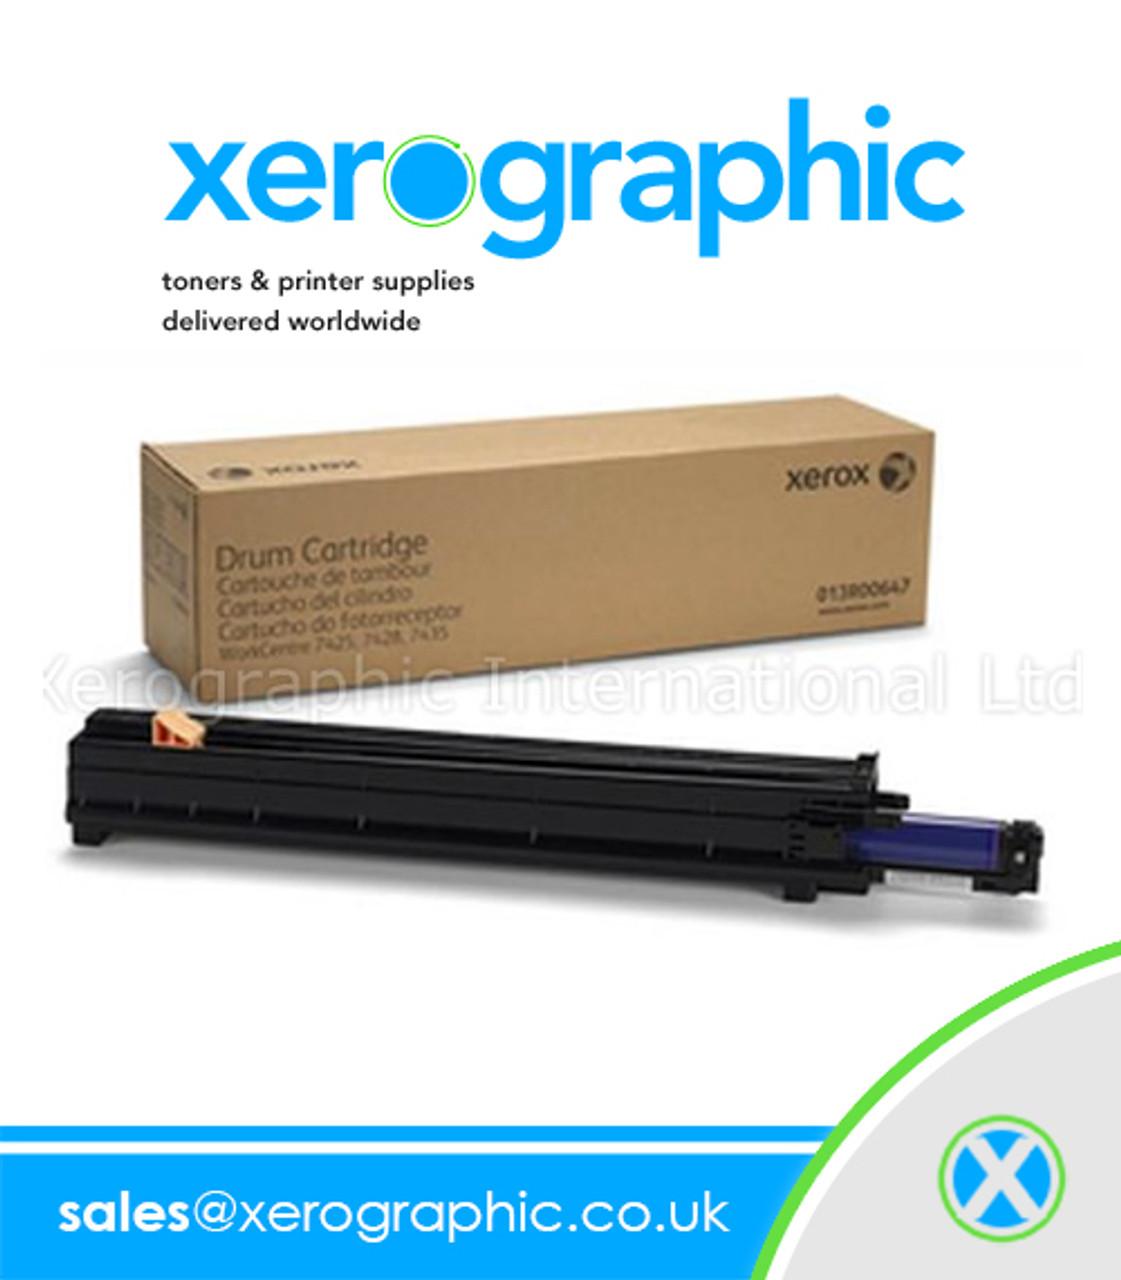 Xerox Genuine Drum Cartridge (£149 00) 013R00662 WorkCentre